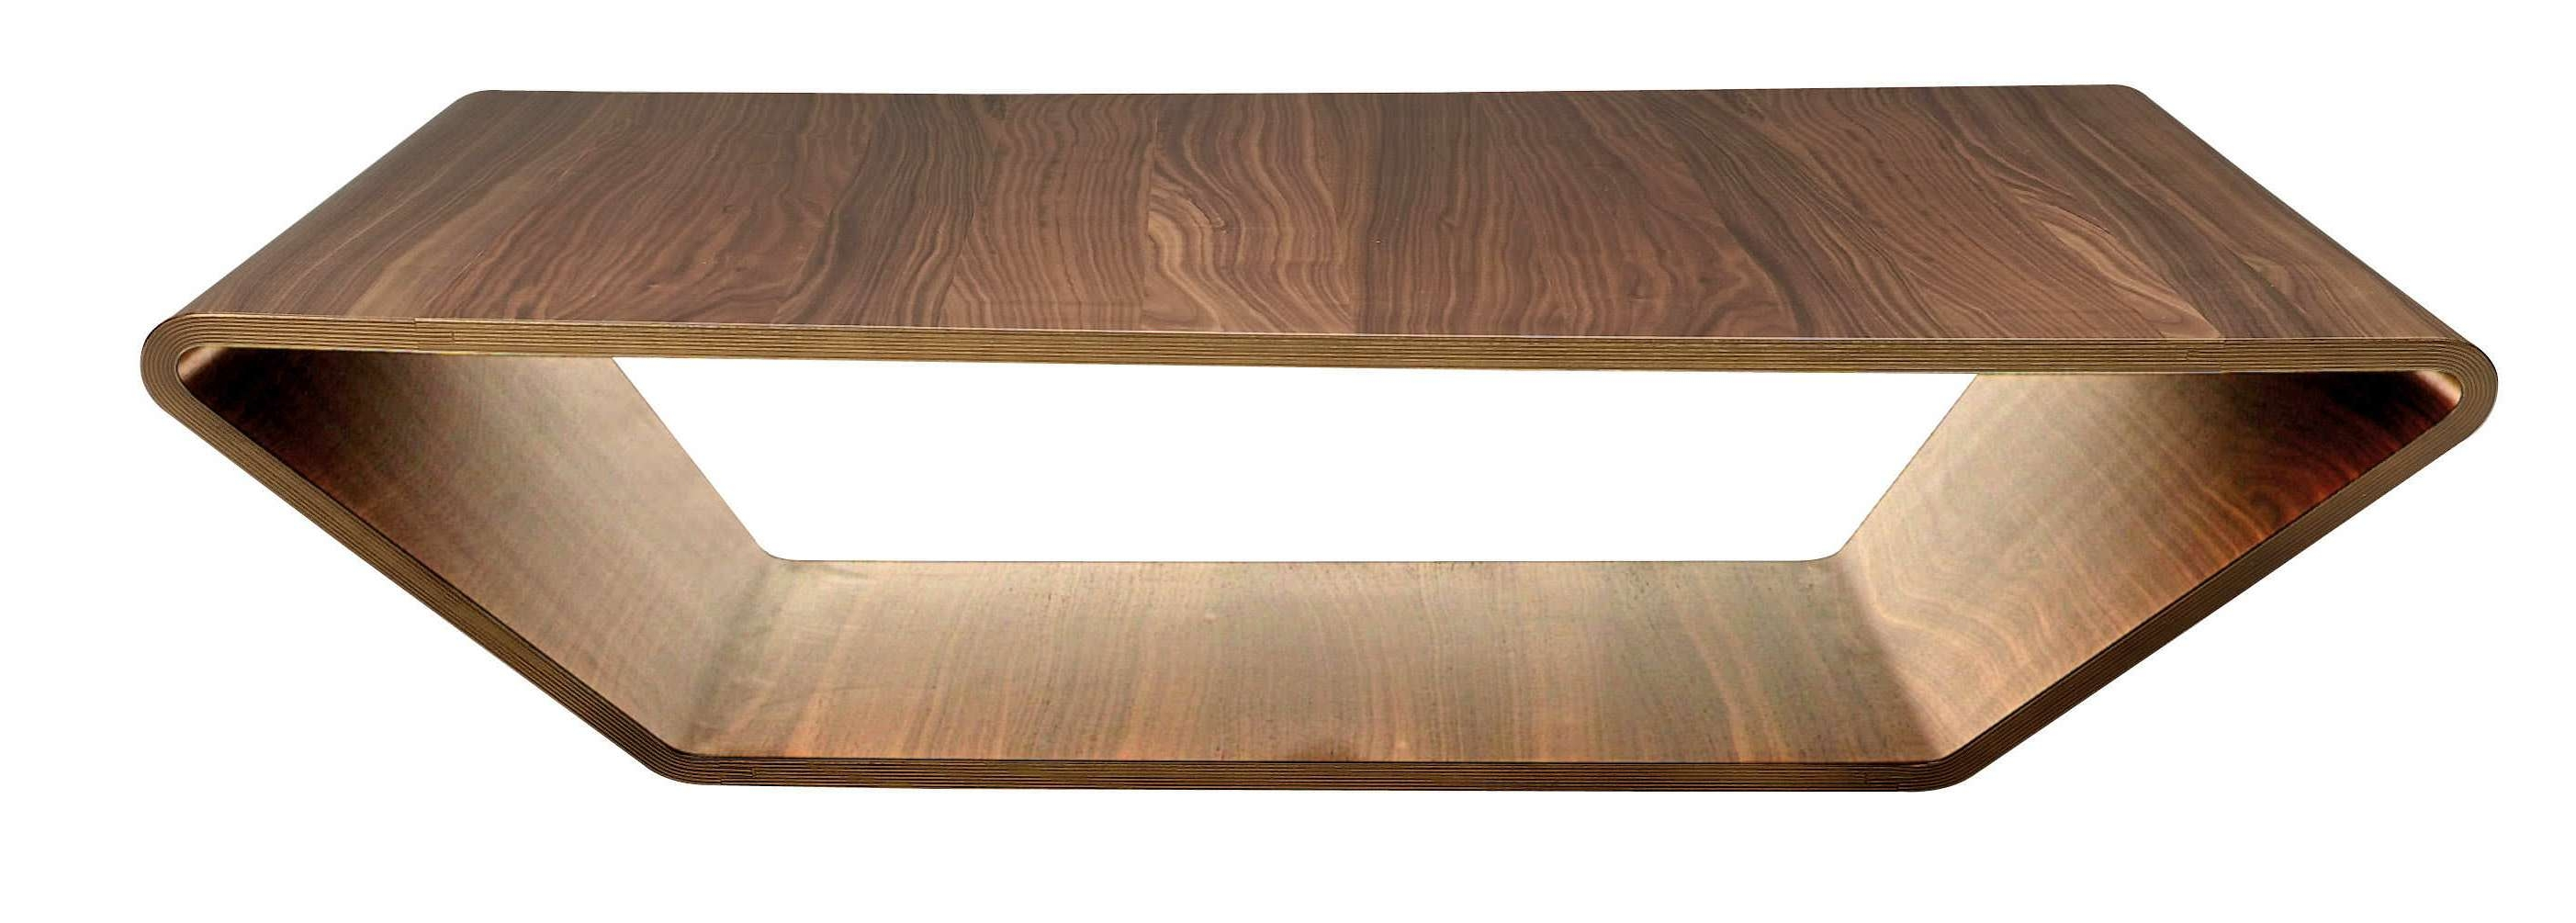 Contemporary Coffee Table / Oak / Walnut / Birch – Brasilia Throughout Favorite Contemporary Oak Coffee Table (View 15 of 20)